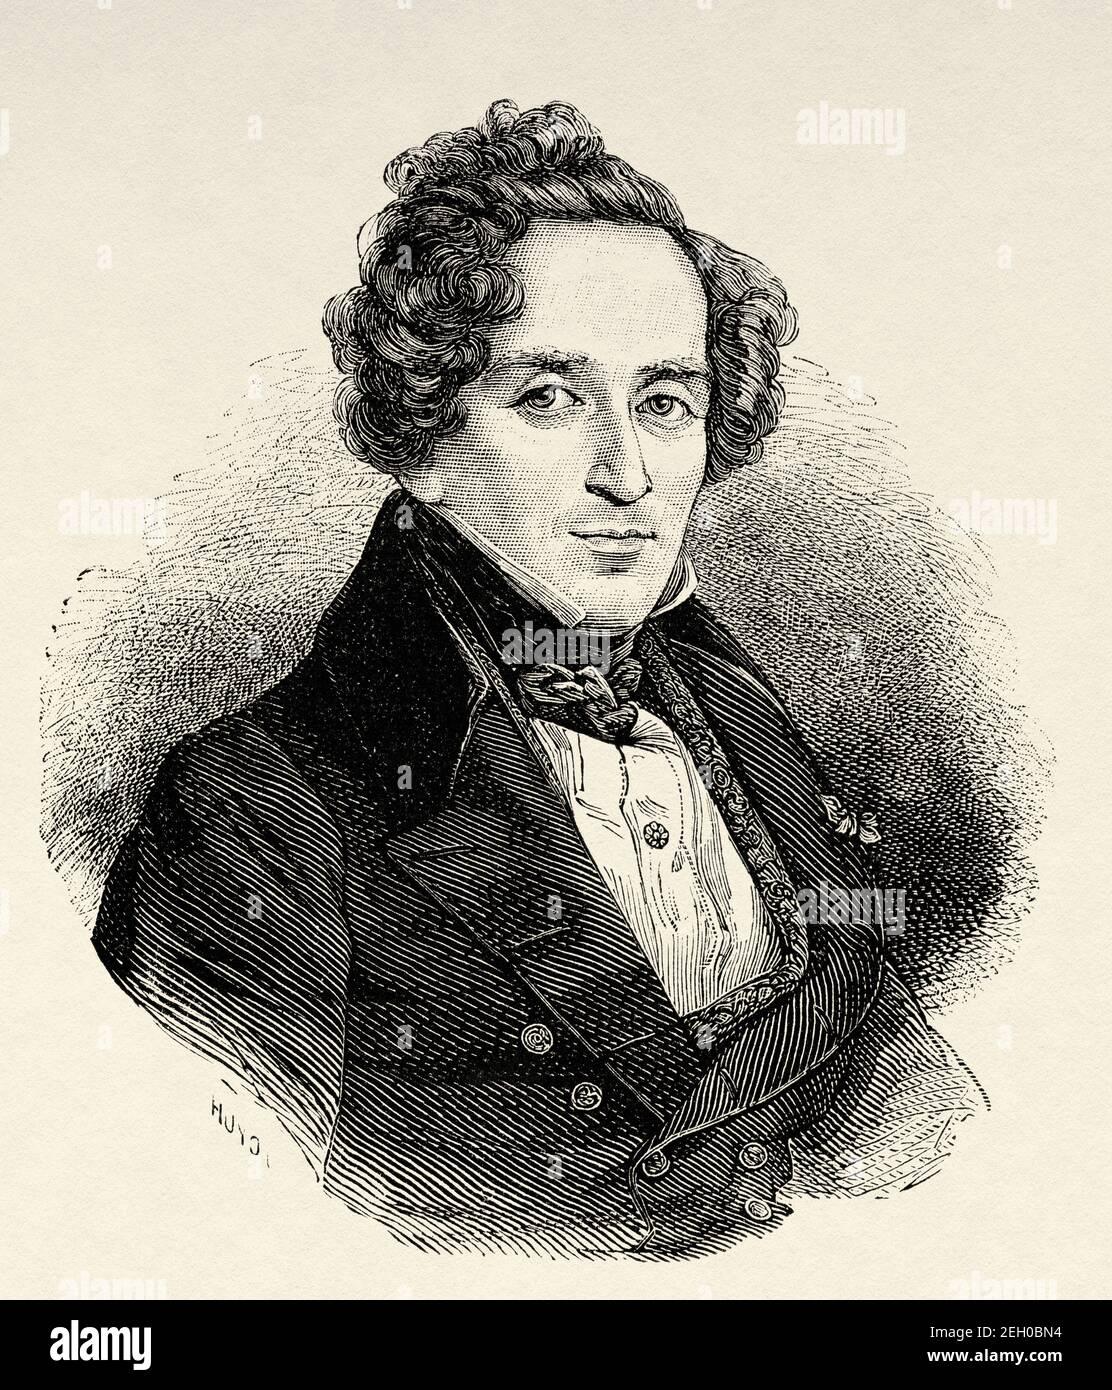 Portrait of the German opera composer Giacomo Meyerbeer (1791-1864) Germany, Europe. Old 19th century engraved illustration from El Mundo Ilustrado 1879 Stock Photo